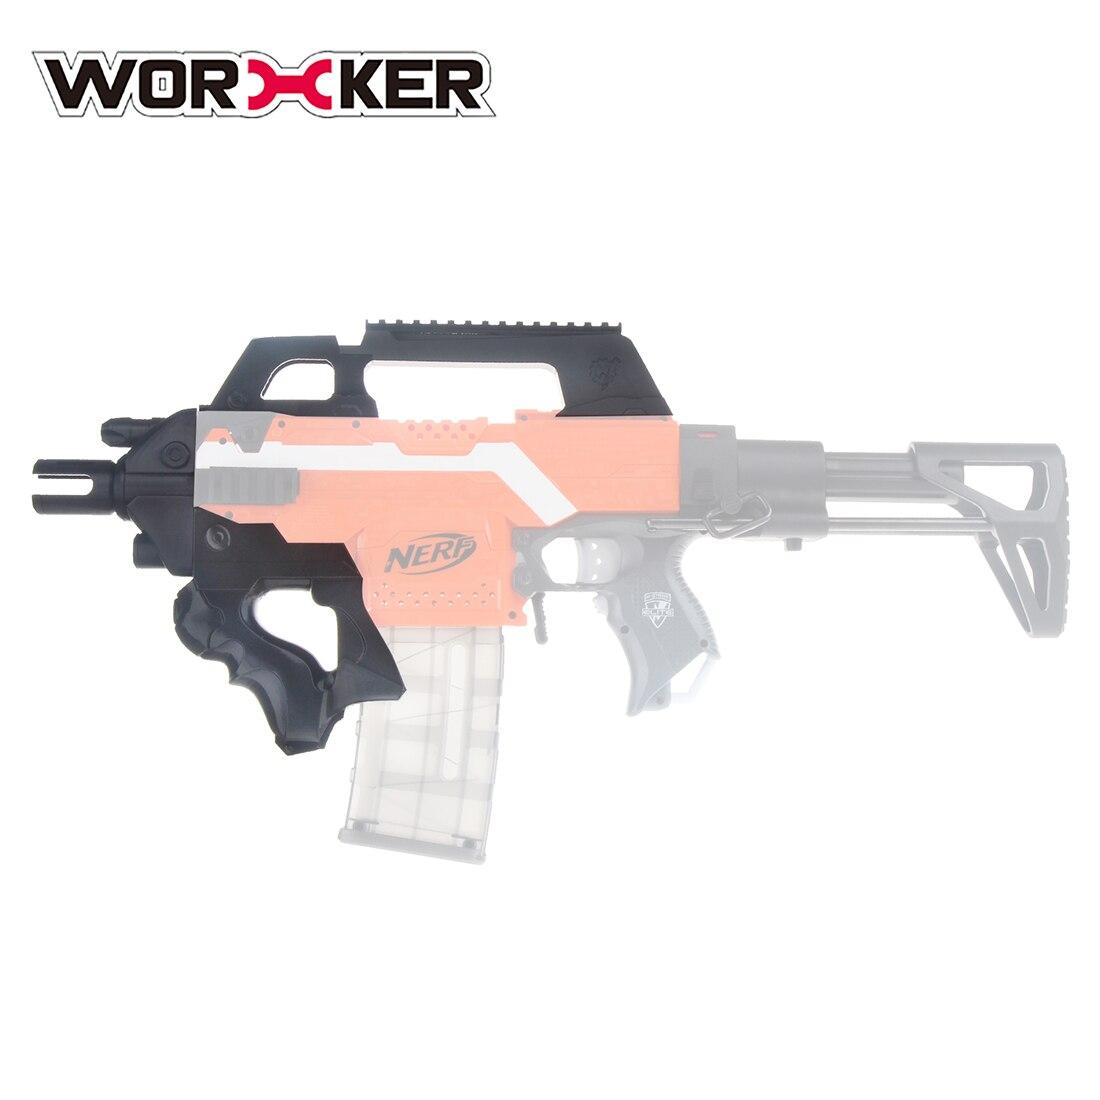 Travailleur F10555 3D Impression No 193 Thunder Type Avant Tube Kit pour Nerf Stryfe-Noir